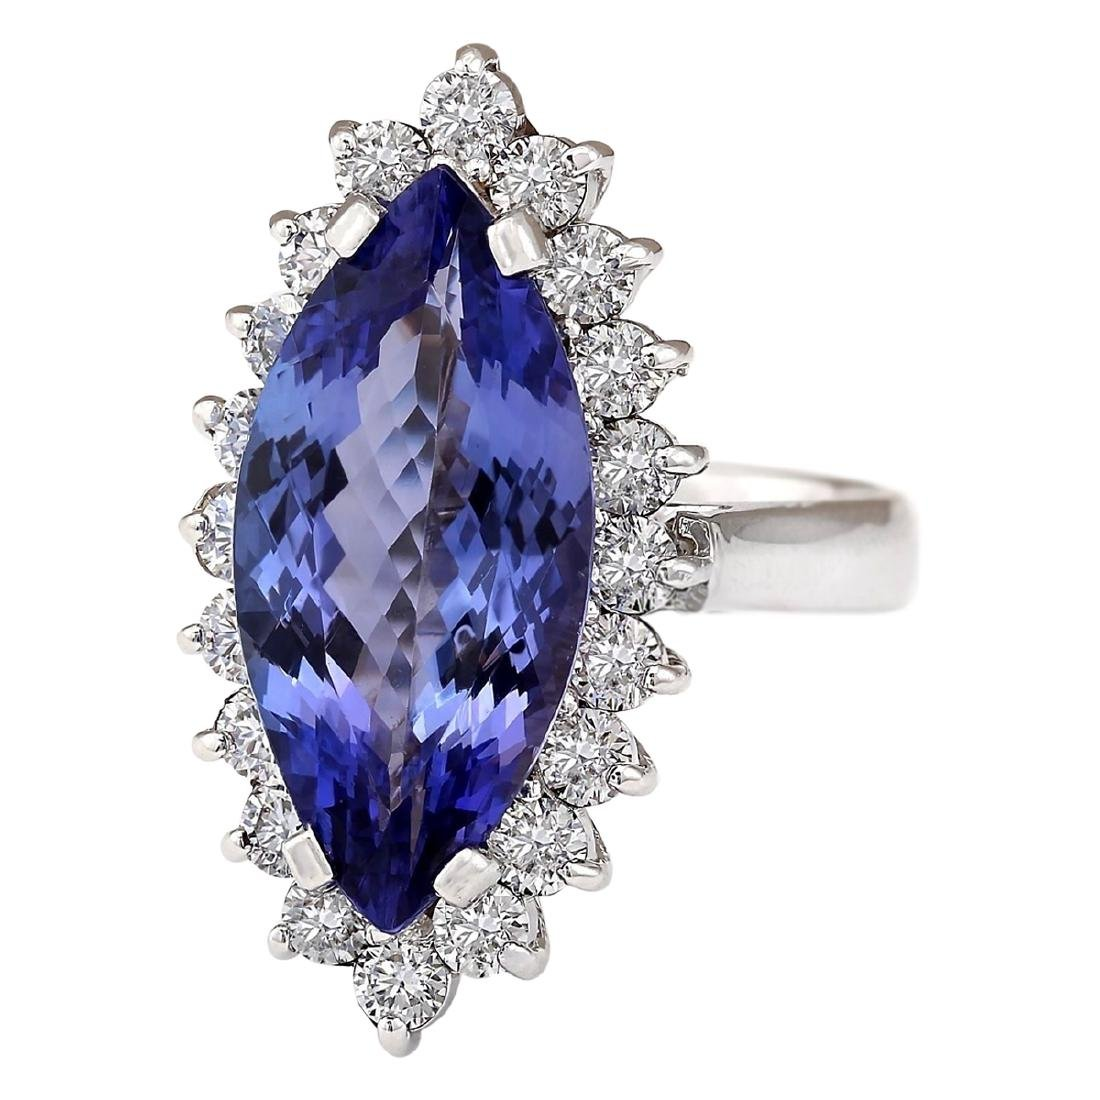 8.80 CTW Natural Blue Tanzanite And Diamond Ring 18K - 2